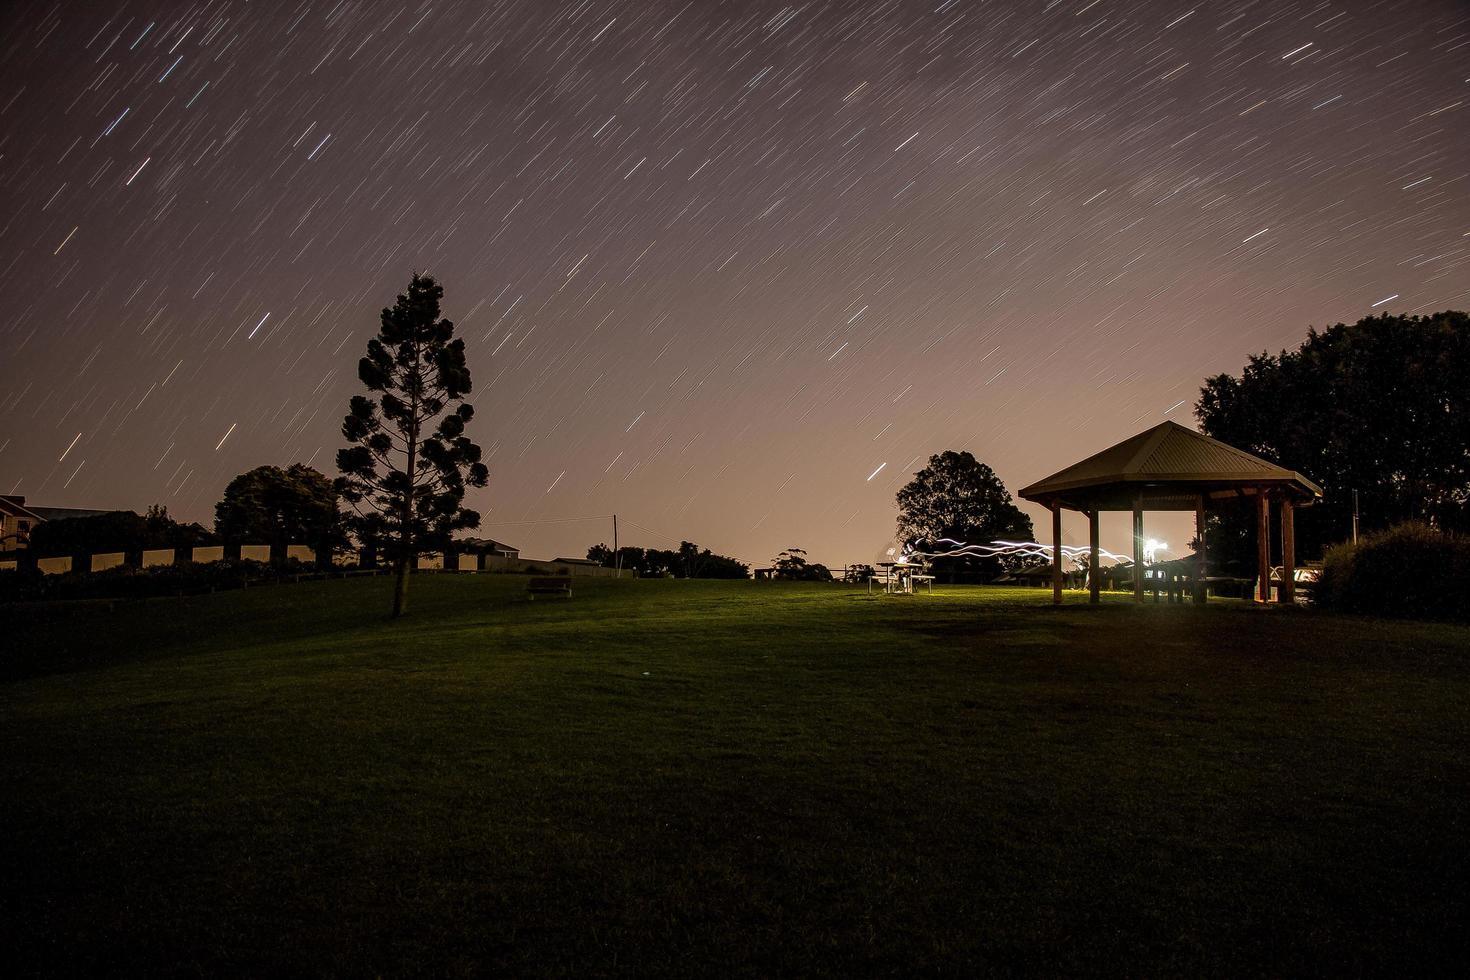 bruin tuinhuisje onder de sterrenhemel foto